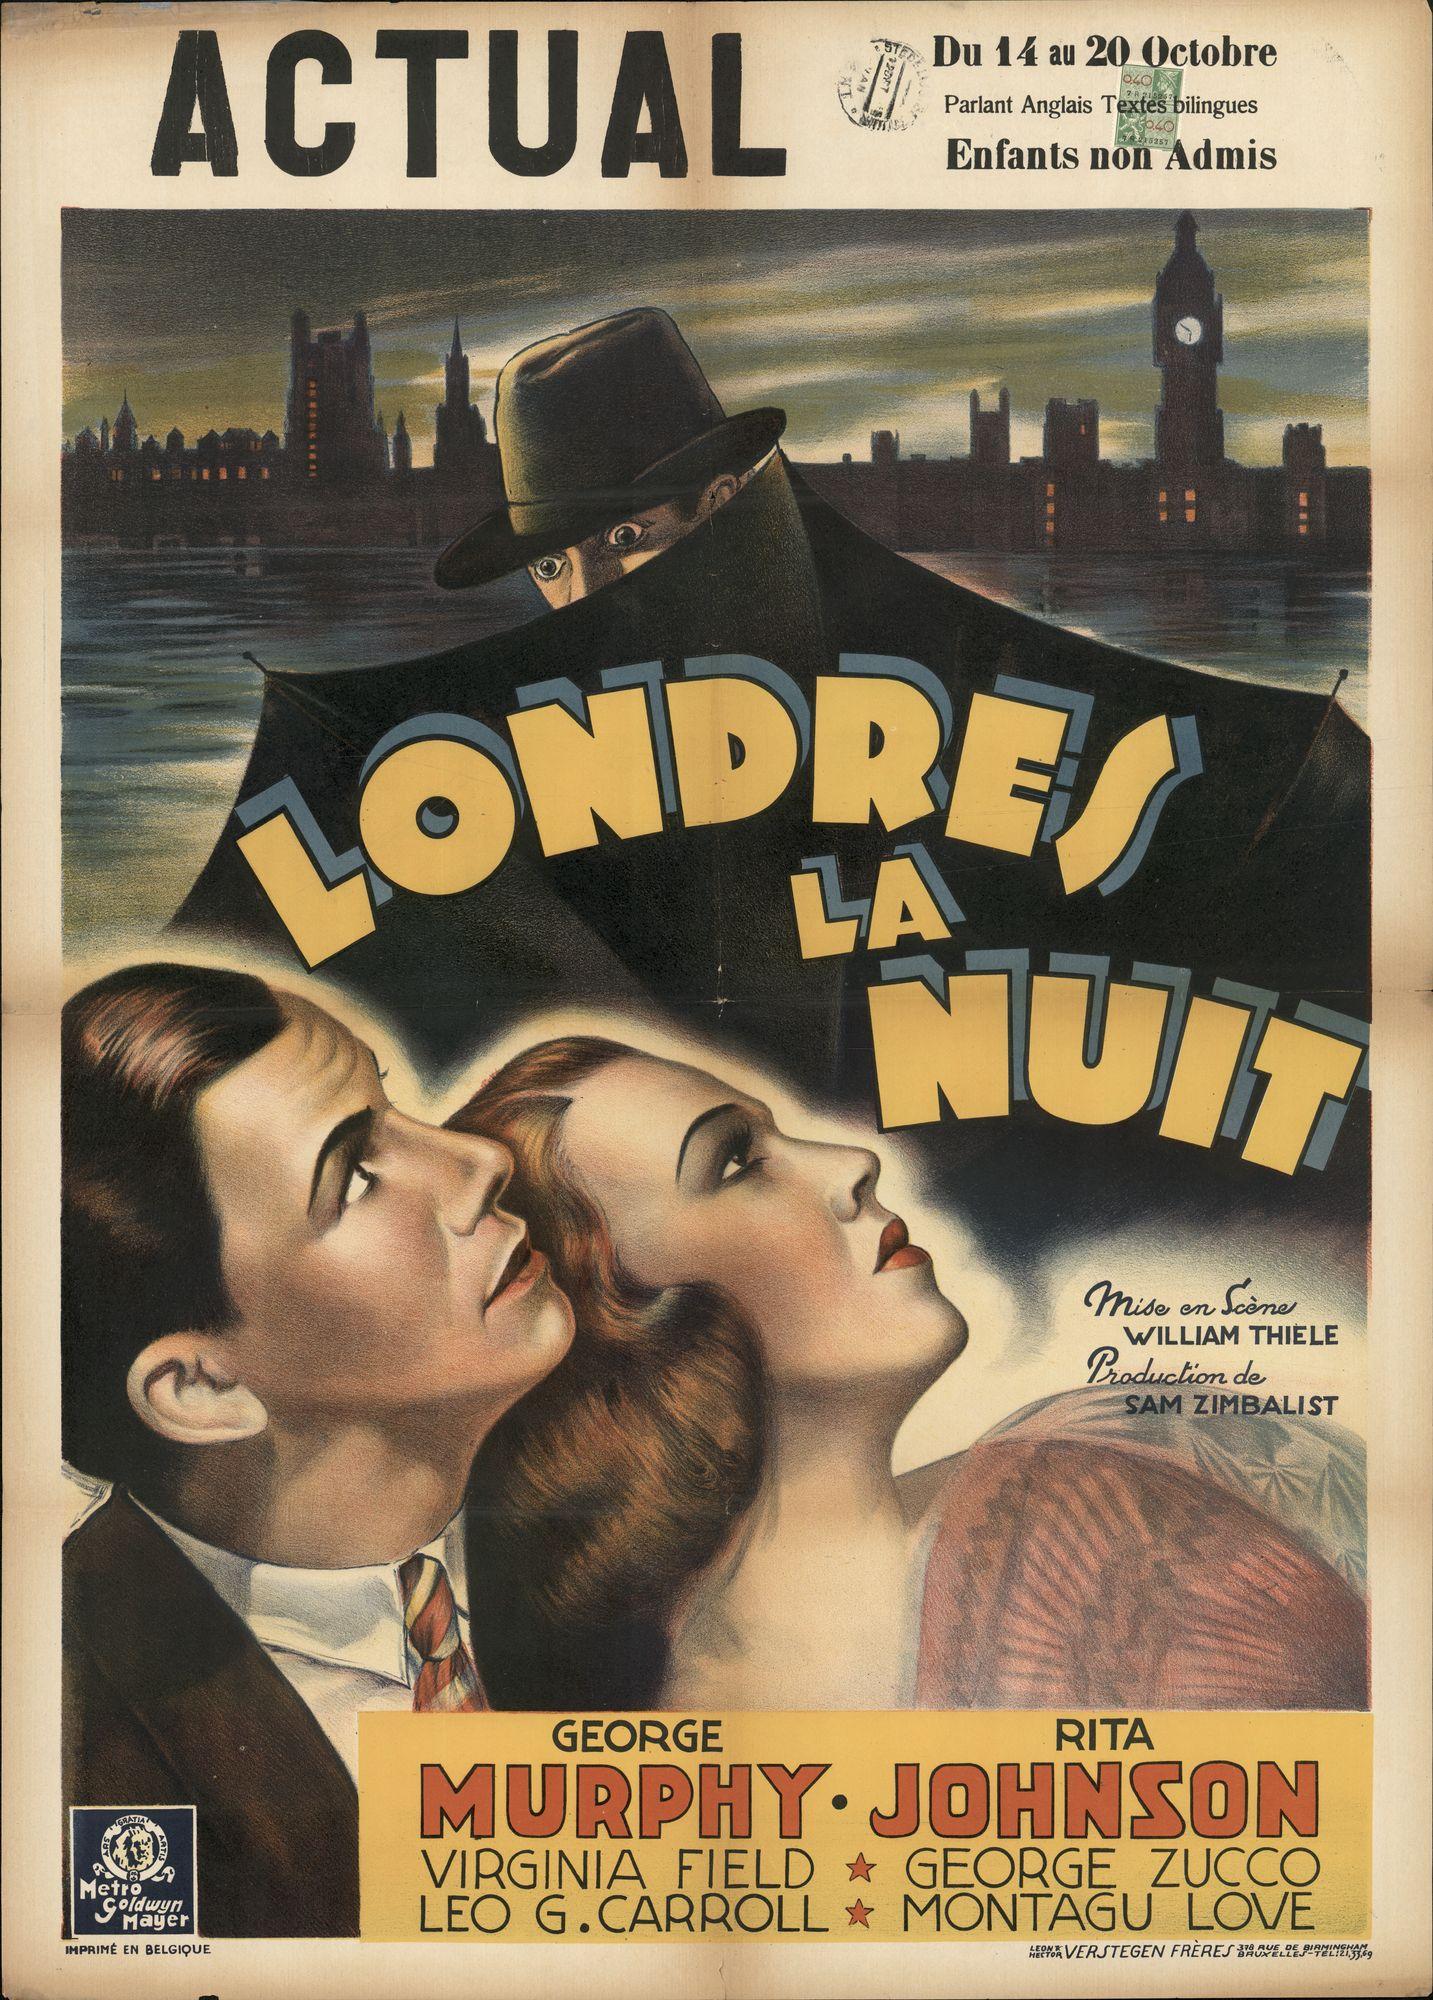 Londres La Nuit, Actual, Gent, 14 - 20 oktober 1948